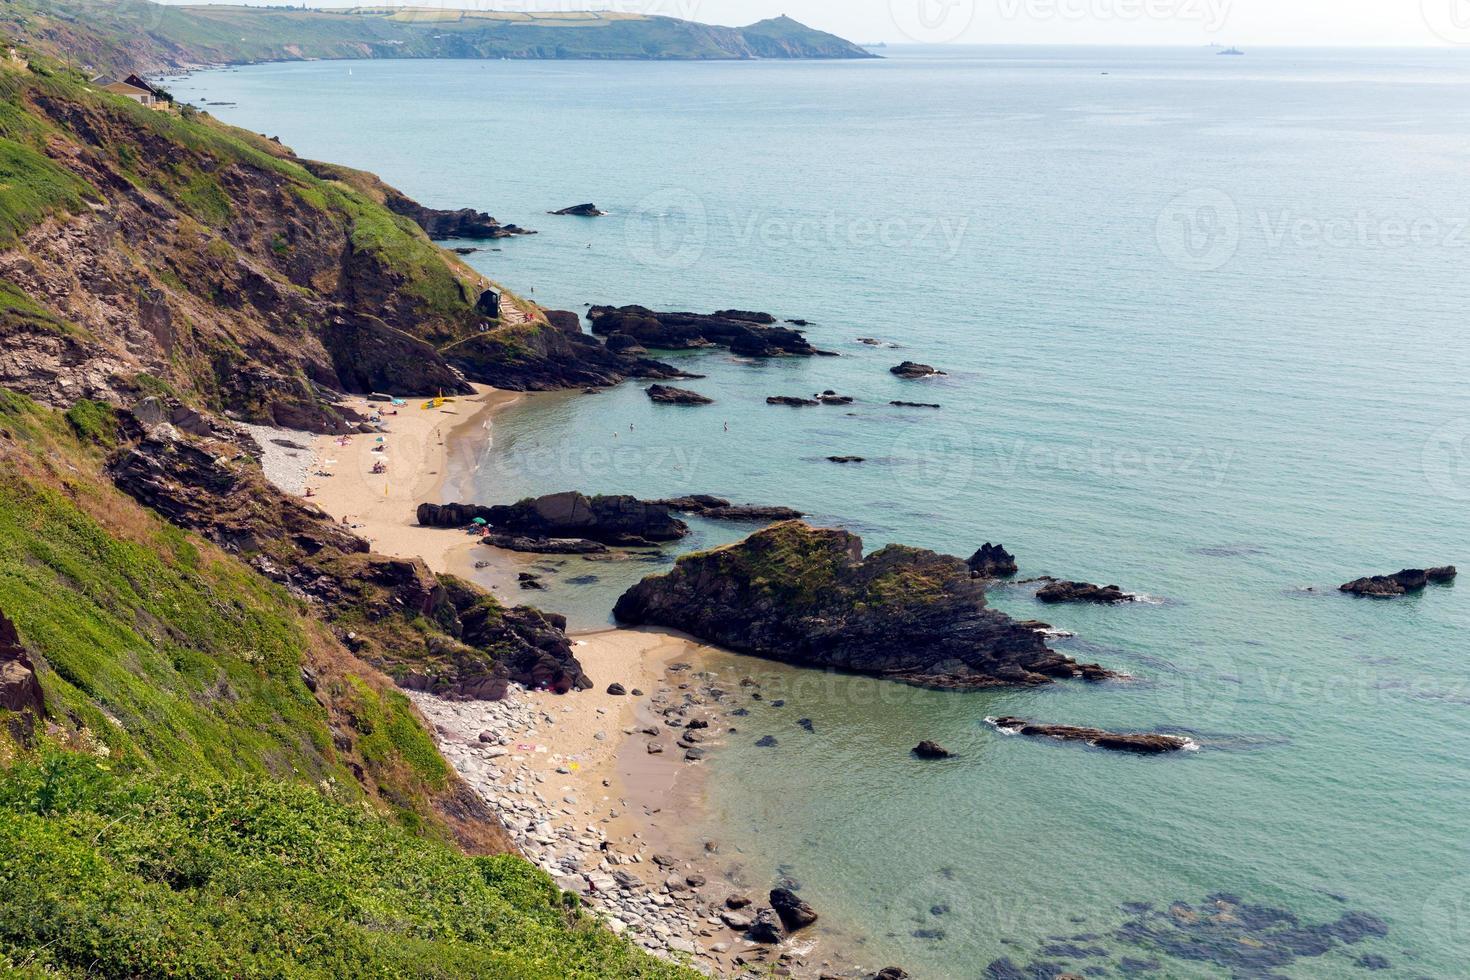 Whitsand Bay Beach Cornwall Coast Inghilterra Regno Unito foto